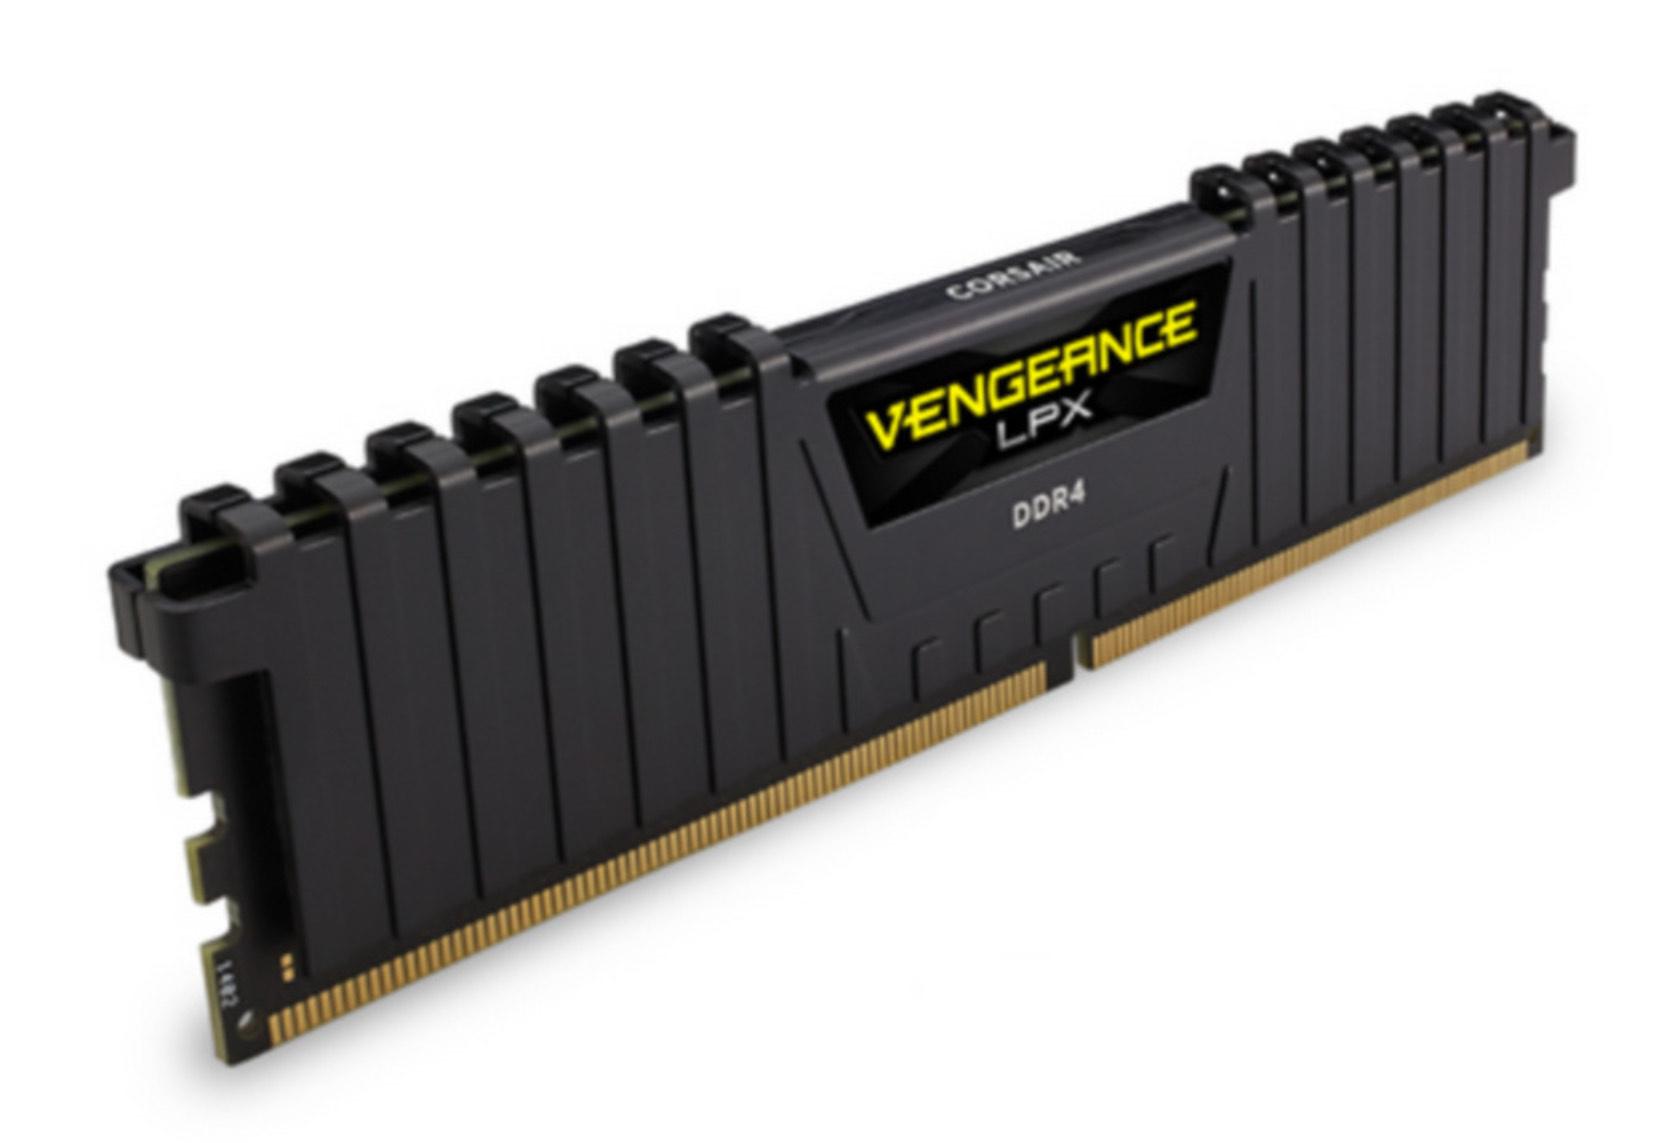 CORSAIR VENGEANCE DDR4 16GB (2X8GB) 2400MHZ CL15